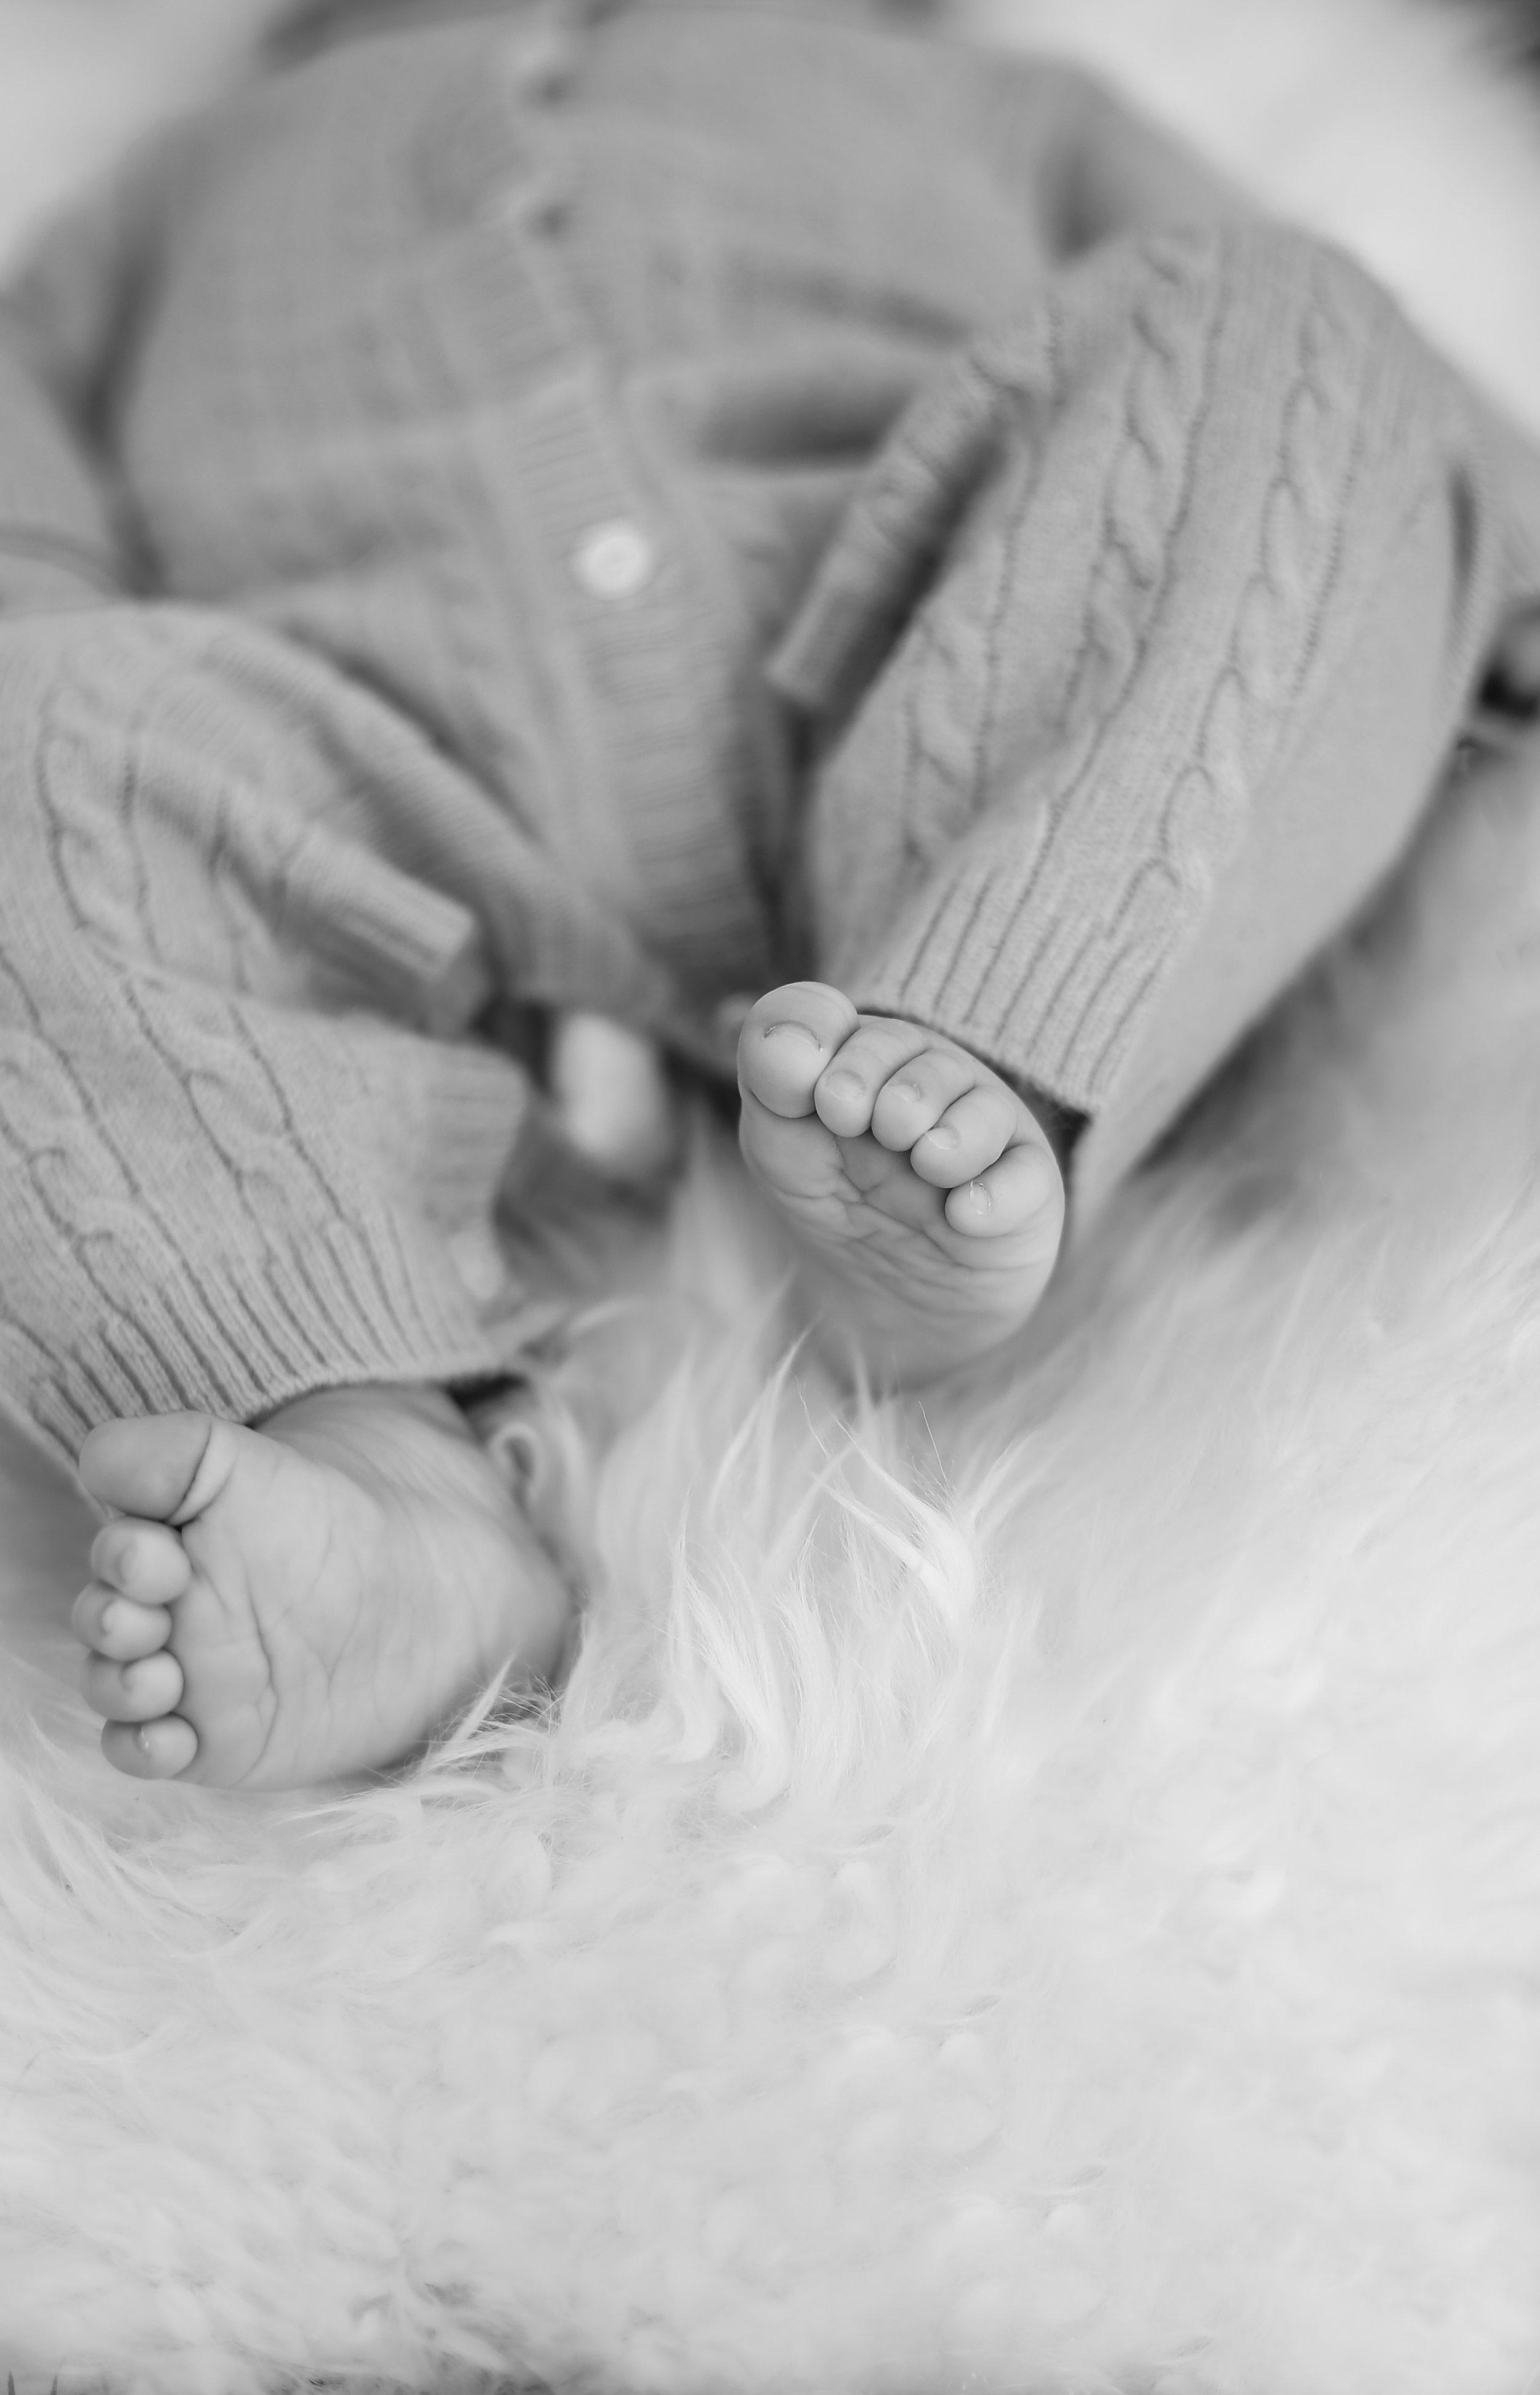 missoula-family-photographer-apaytonphoto-22.jpg